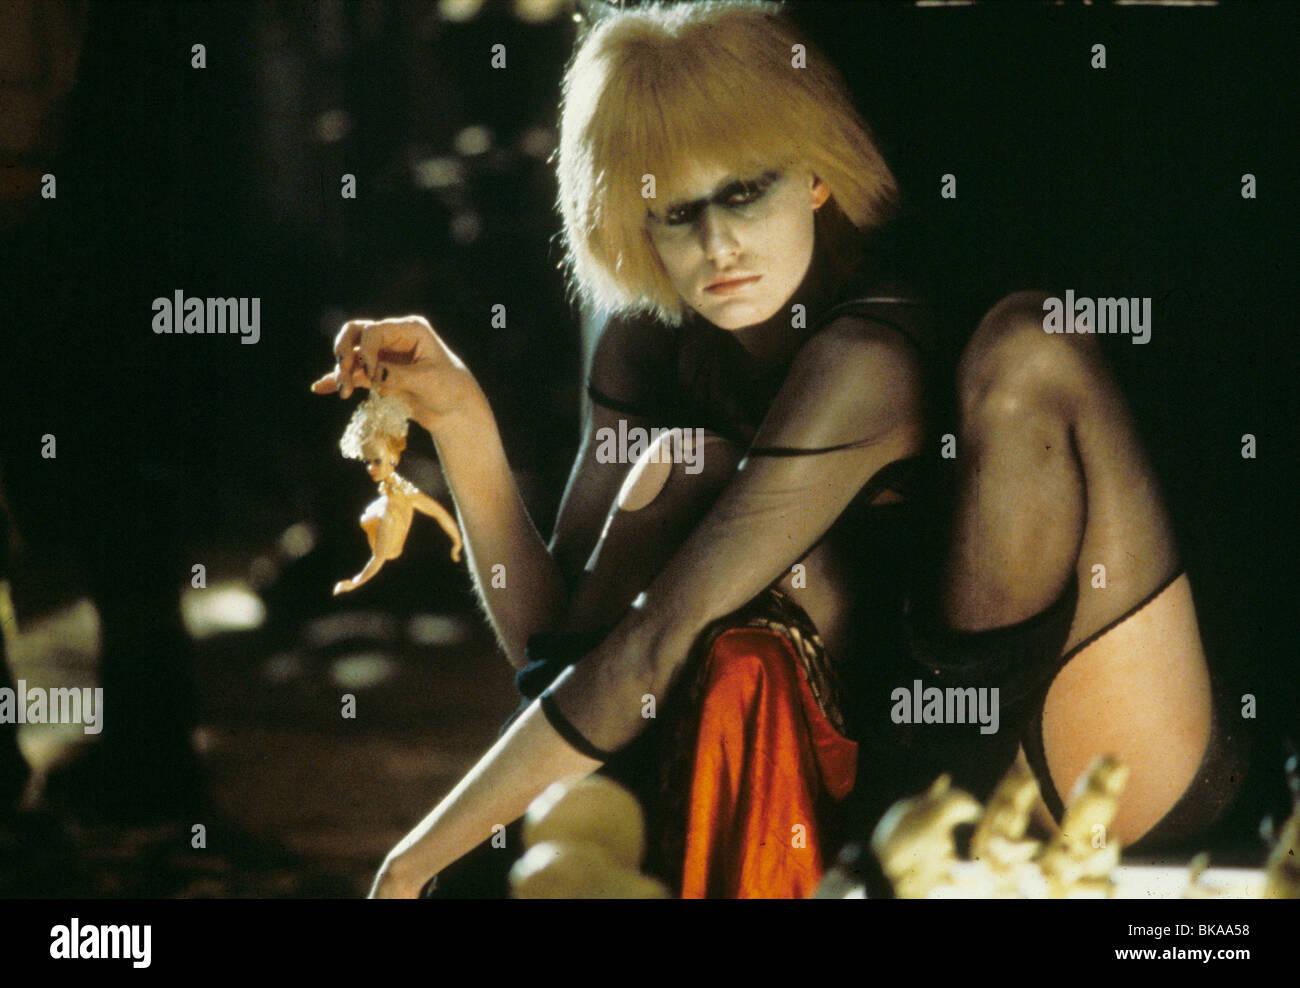 BLADE RUNNER -1982 DARYL HANNAH - Stock Image